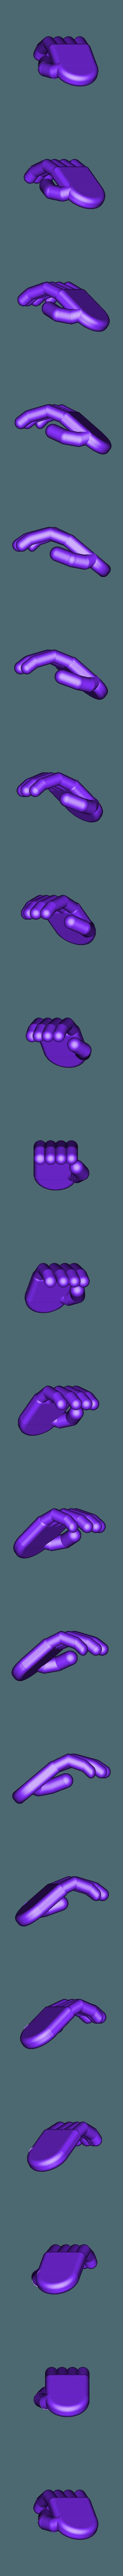 hand2.stl Download free STL file Hand • Object to 3D print, wjordan819